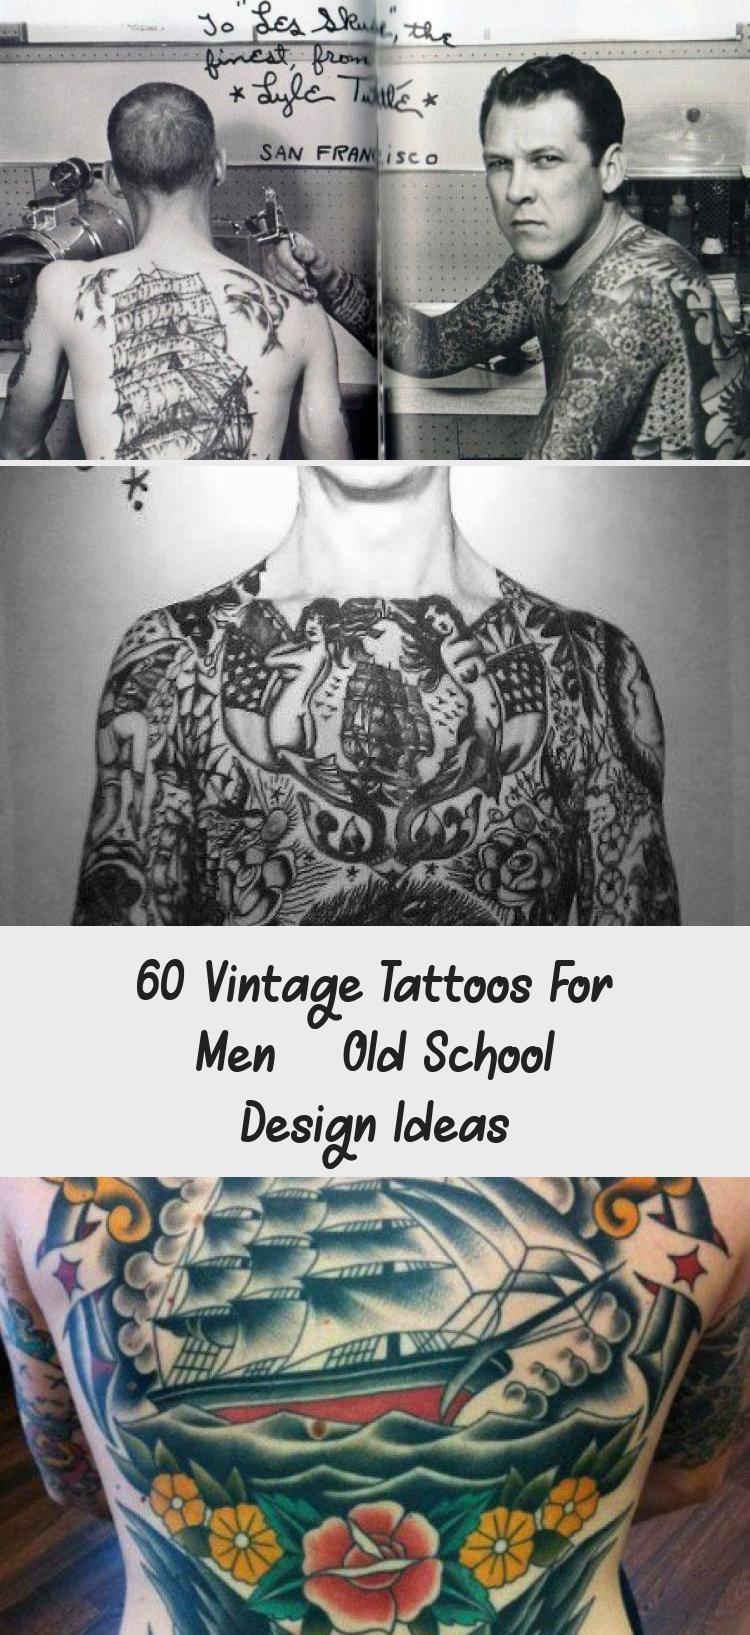 60 Vintage Tattoos For Men - Old School Design Ideas